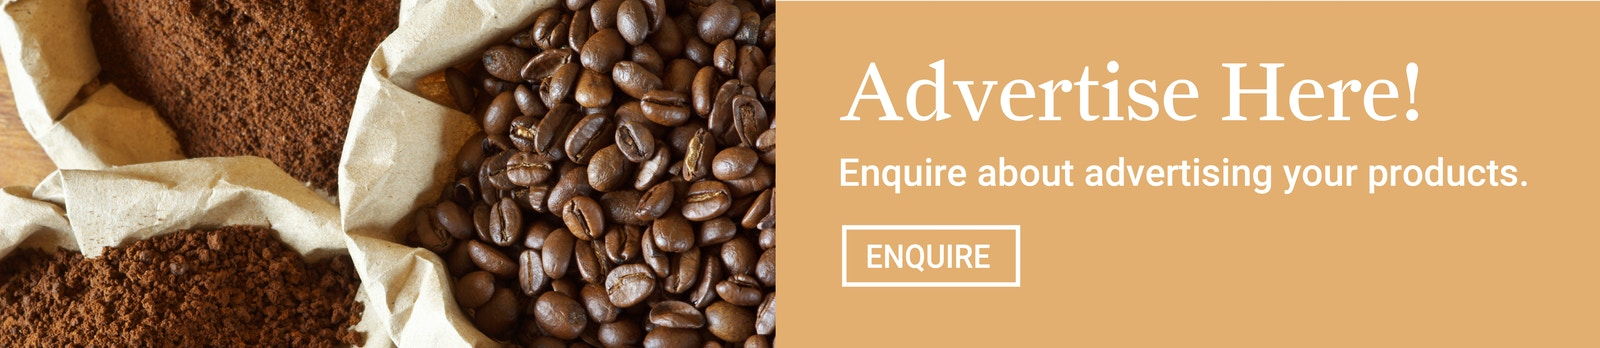 Coffee Promo Banner